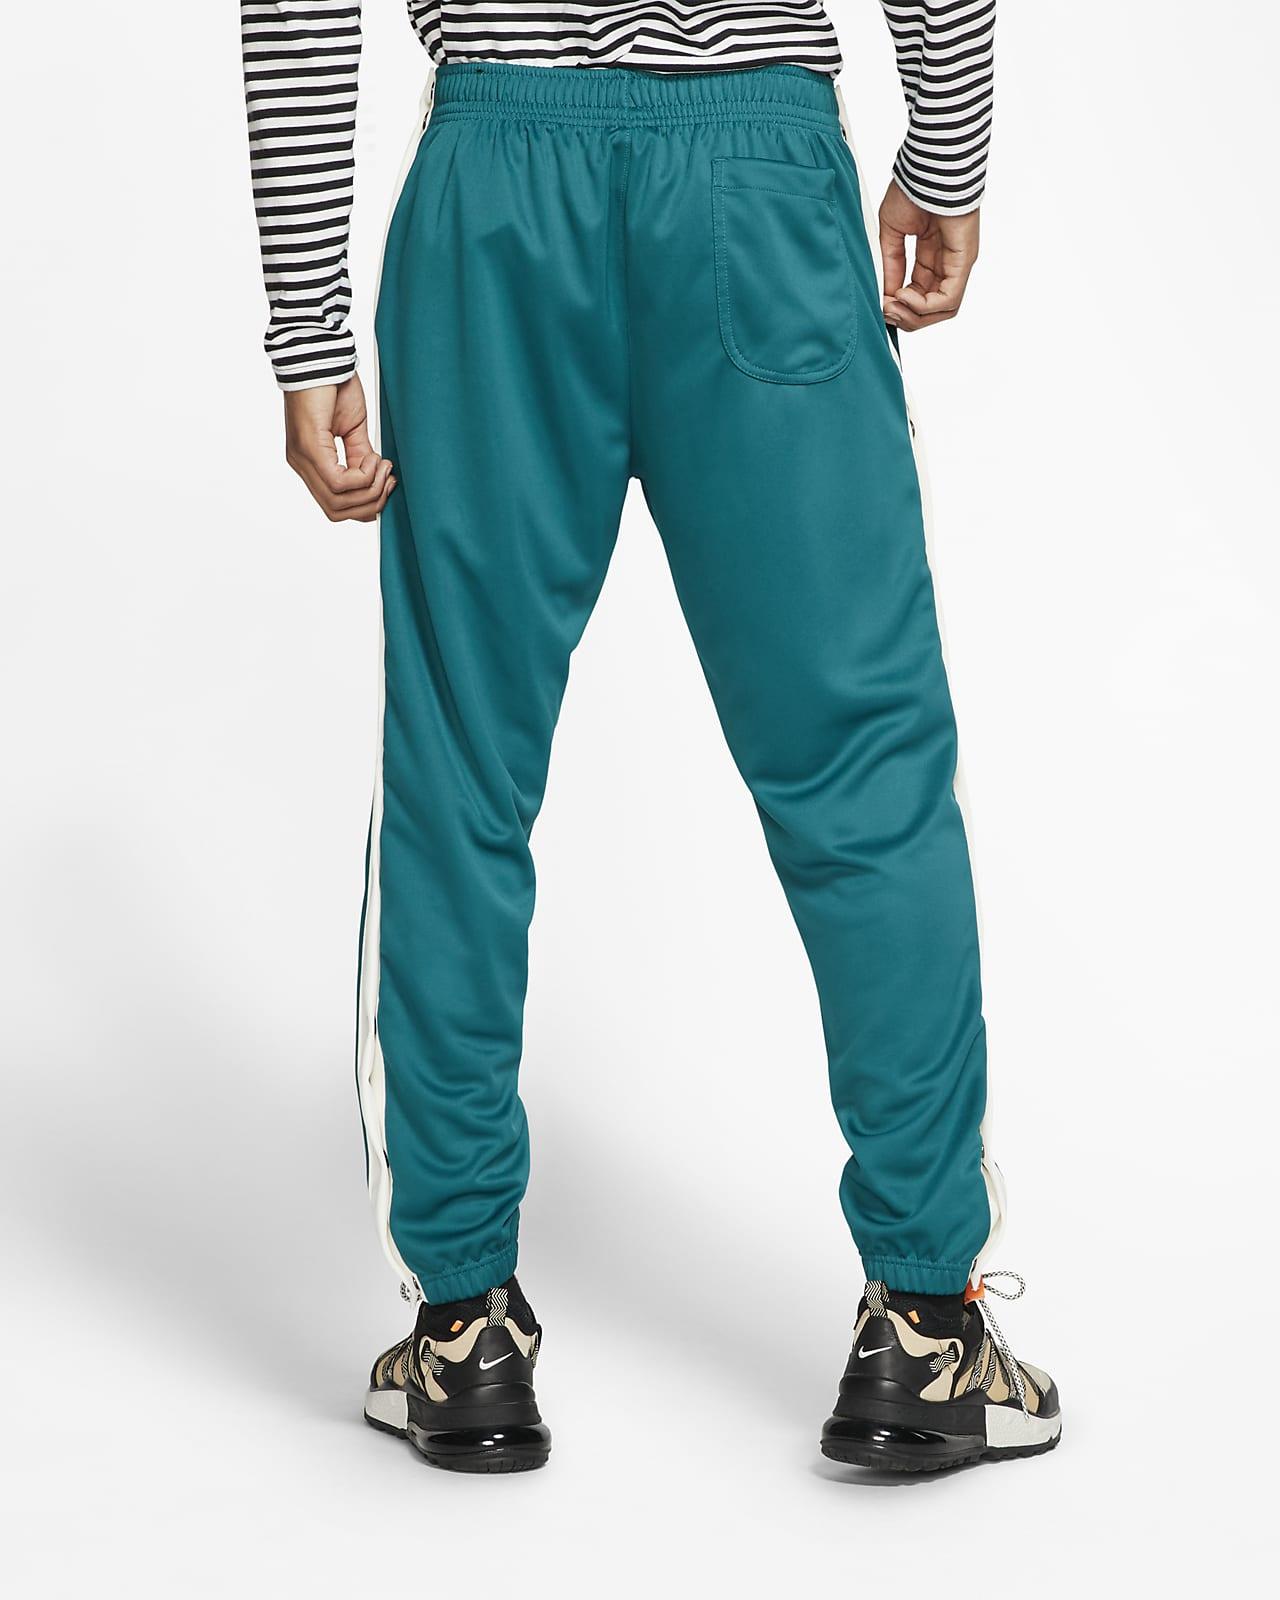 Contribuyente Colgar Egipto  Men's Dance Trousers & Tights. Nike GB